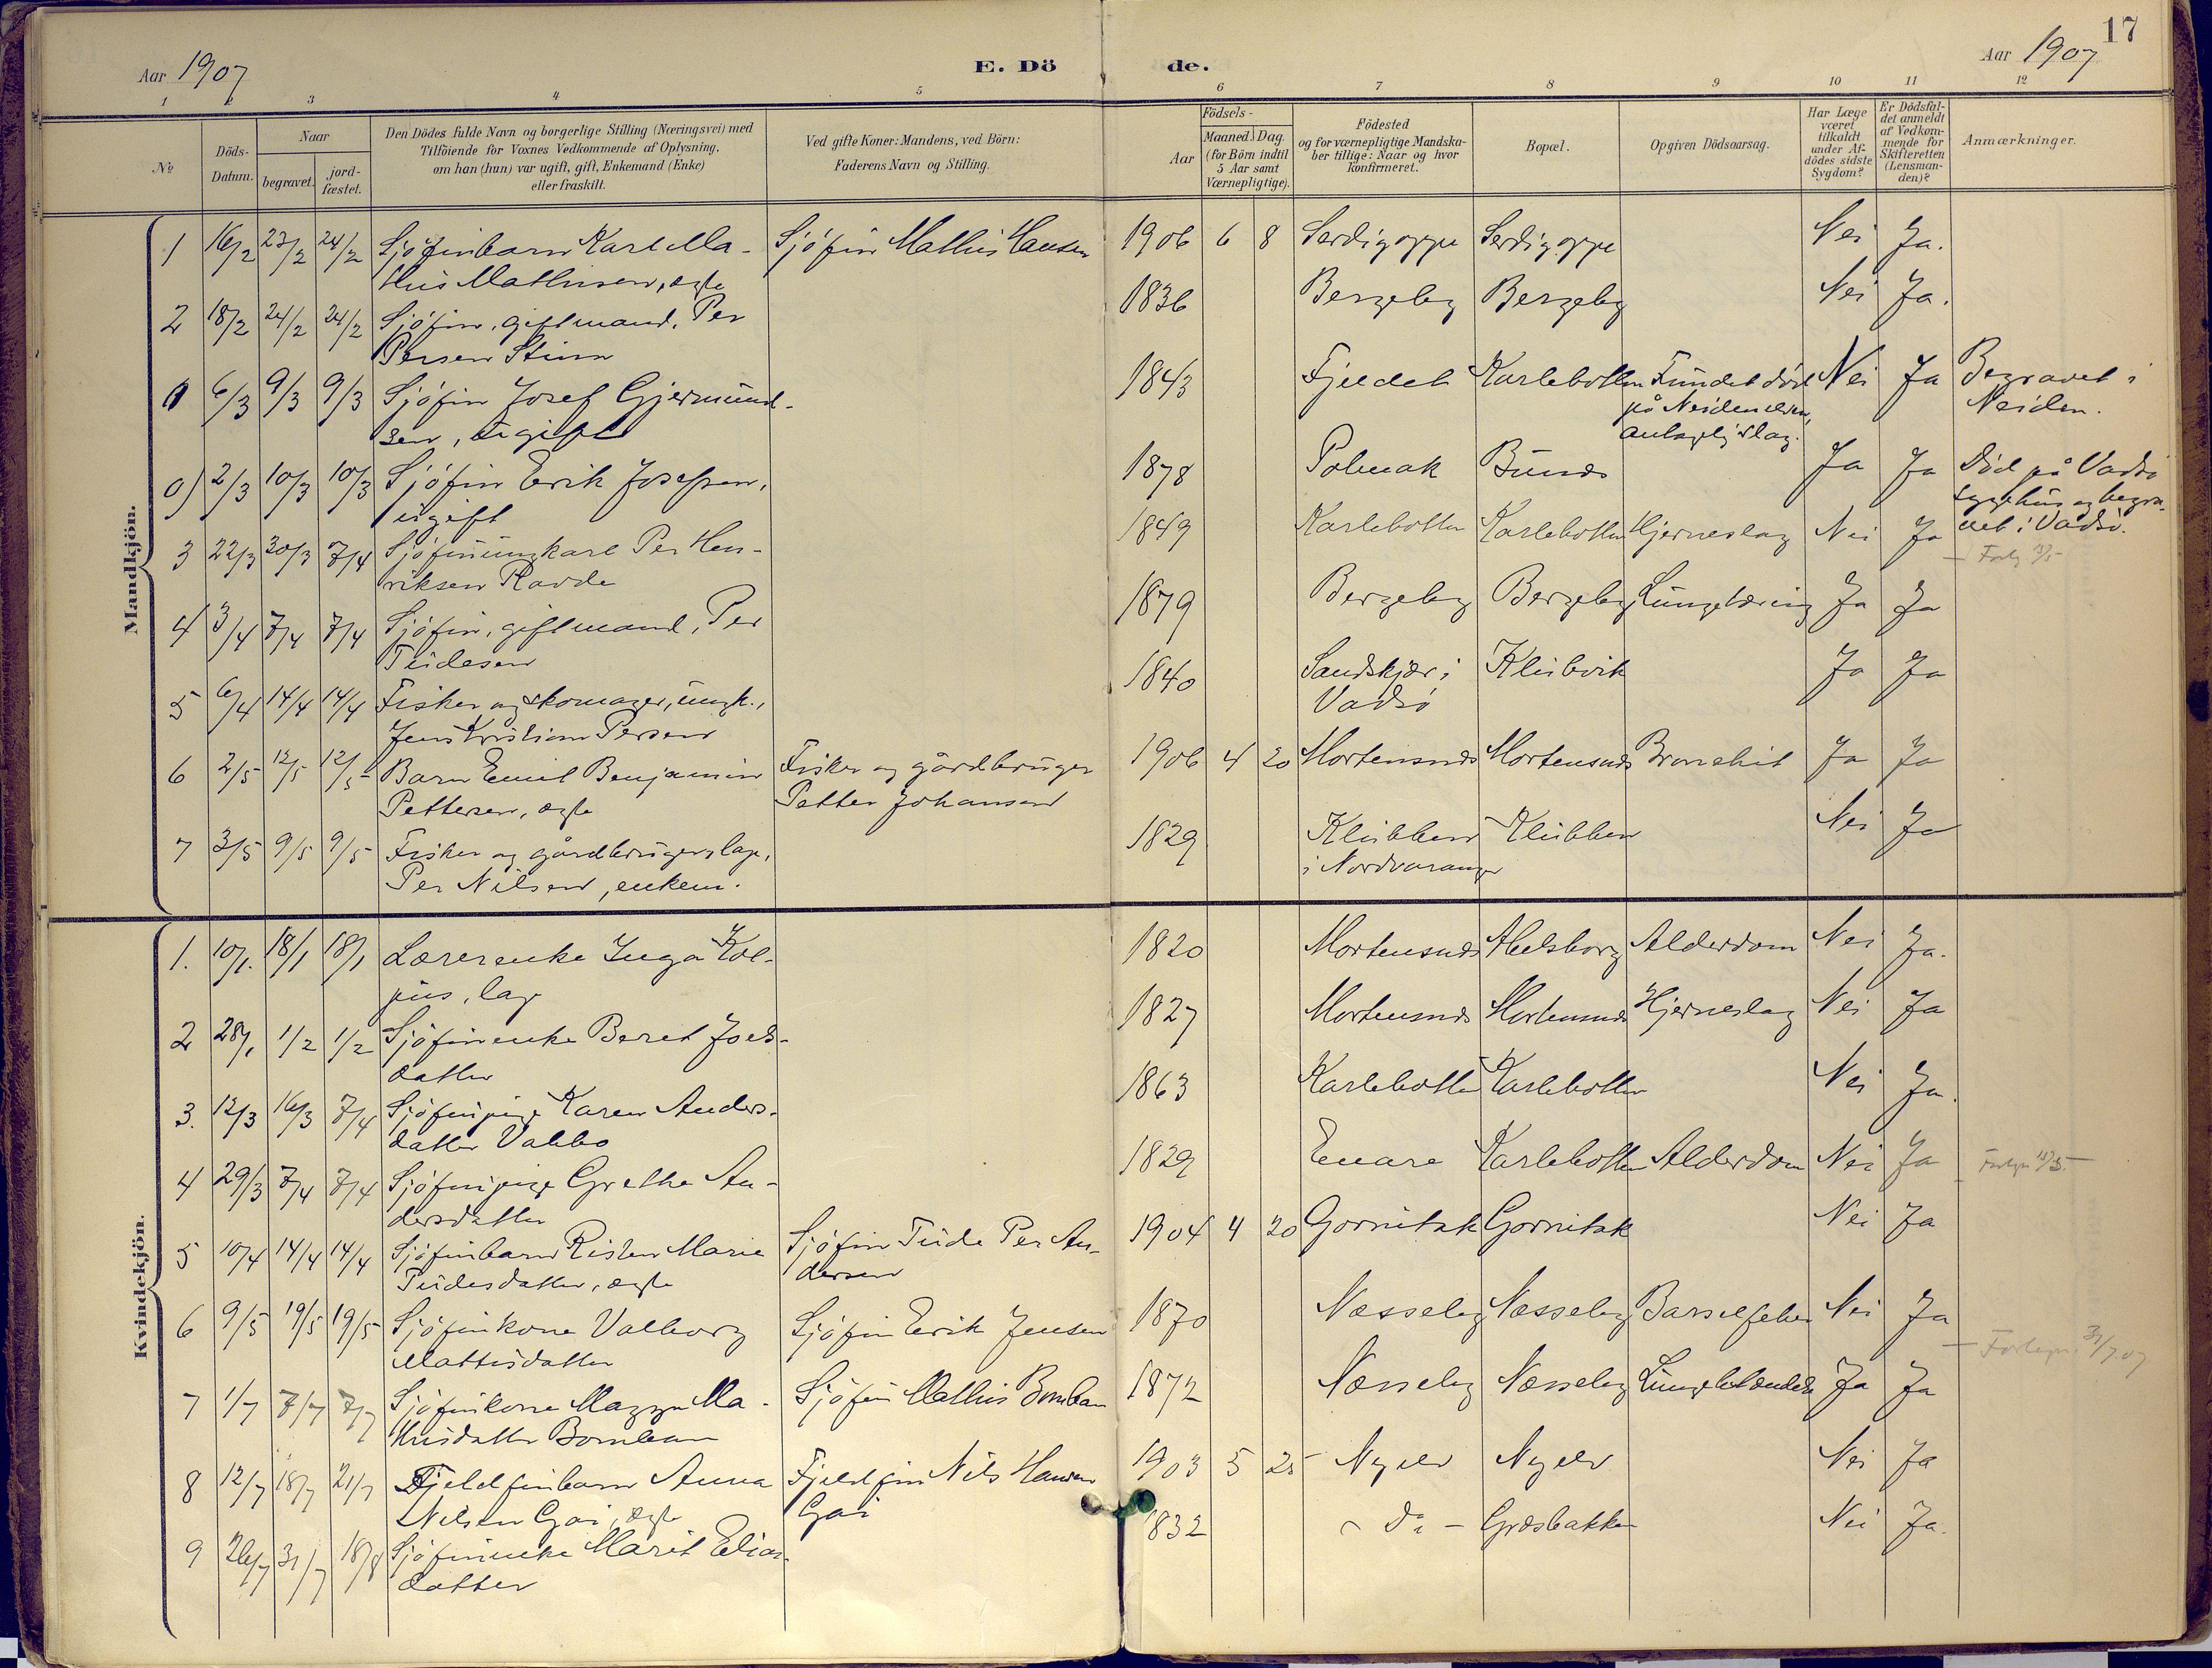 SATØ, Nesseby sokneprestkontor, H/Ha/L0007kirke: Ministerialbok nr. 7, 1898-1921, s. 17